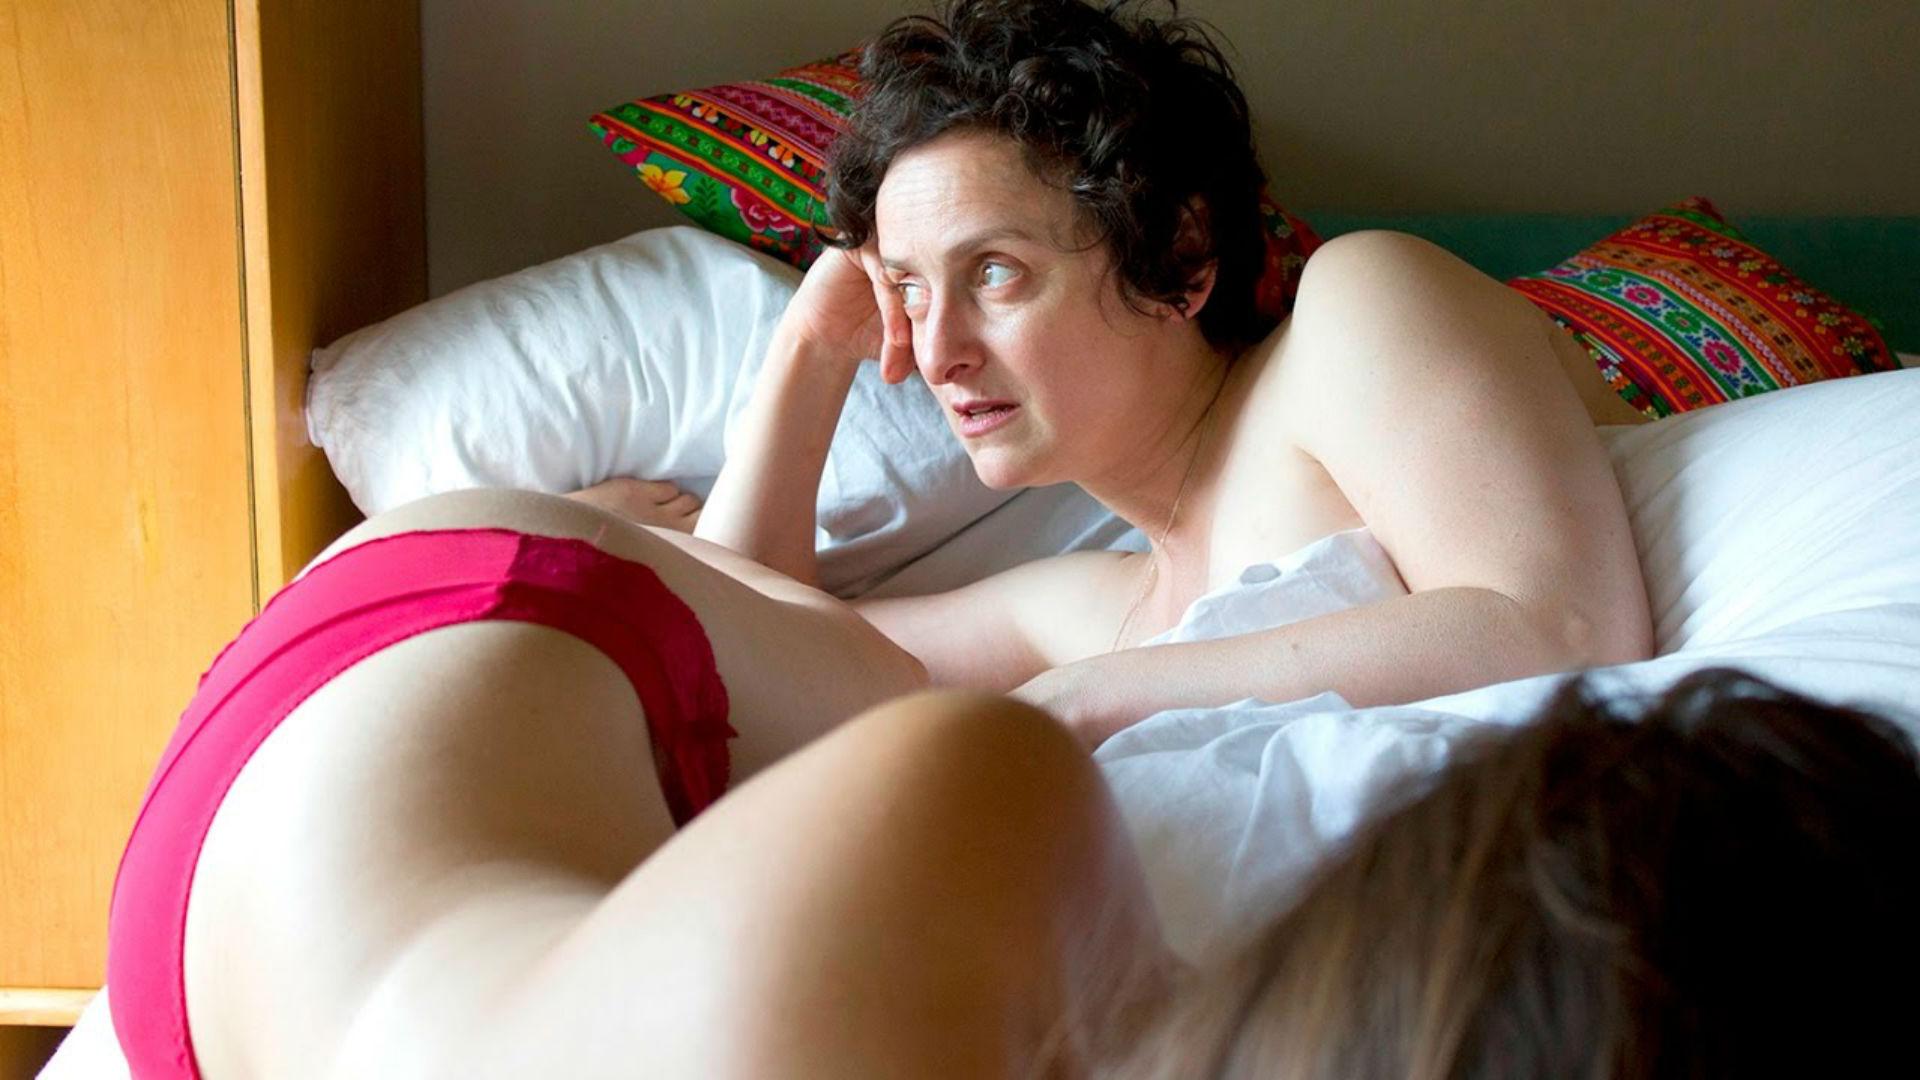 Carlisle Studer Nude Photos 36